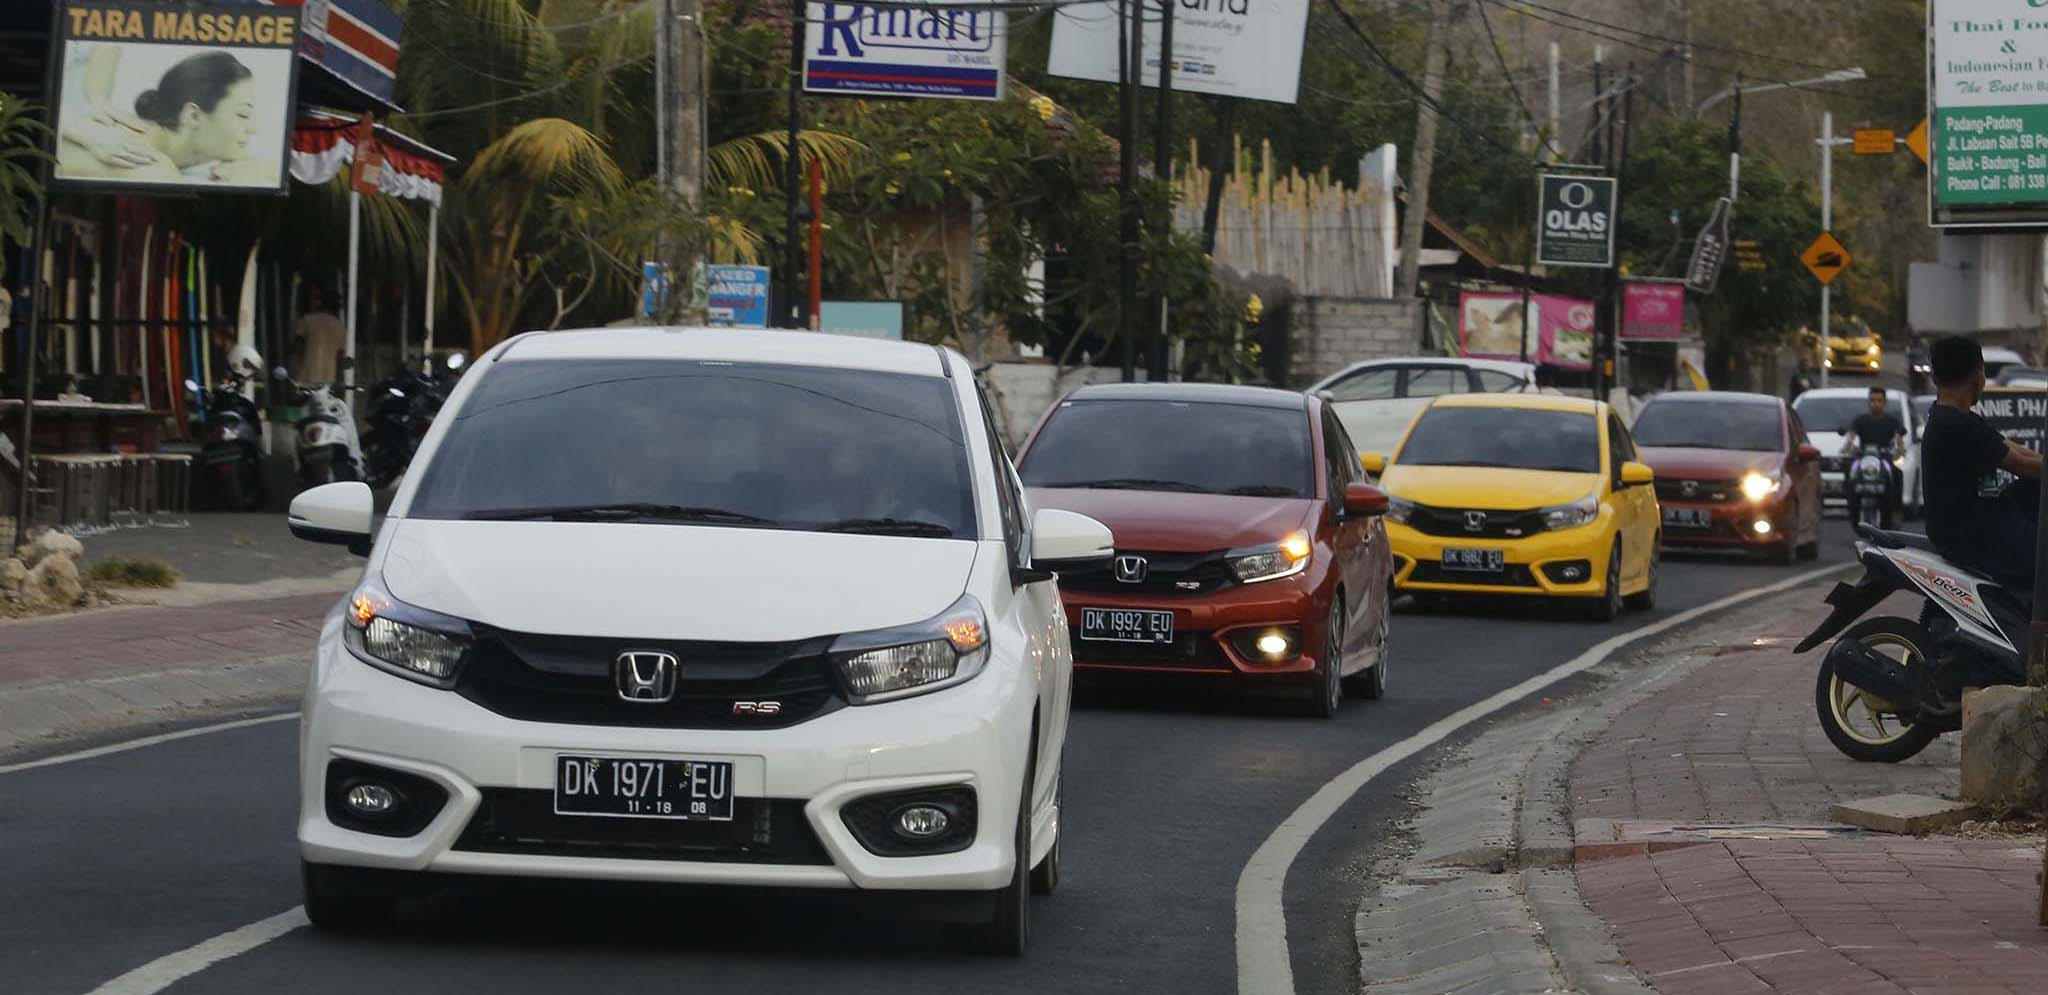 All New Honda Brio meraih penjualan sebanyak 6.703 unit sepanjang bulan Oktober